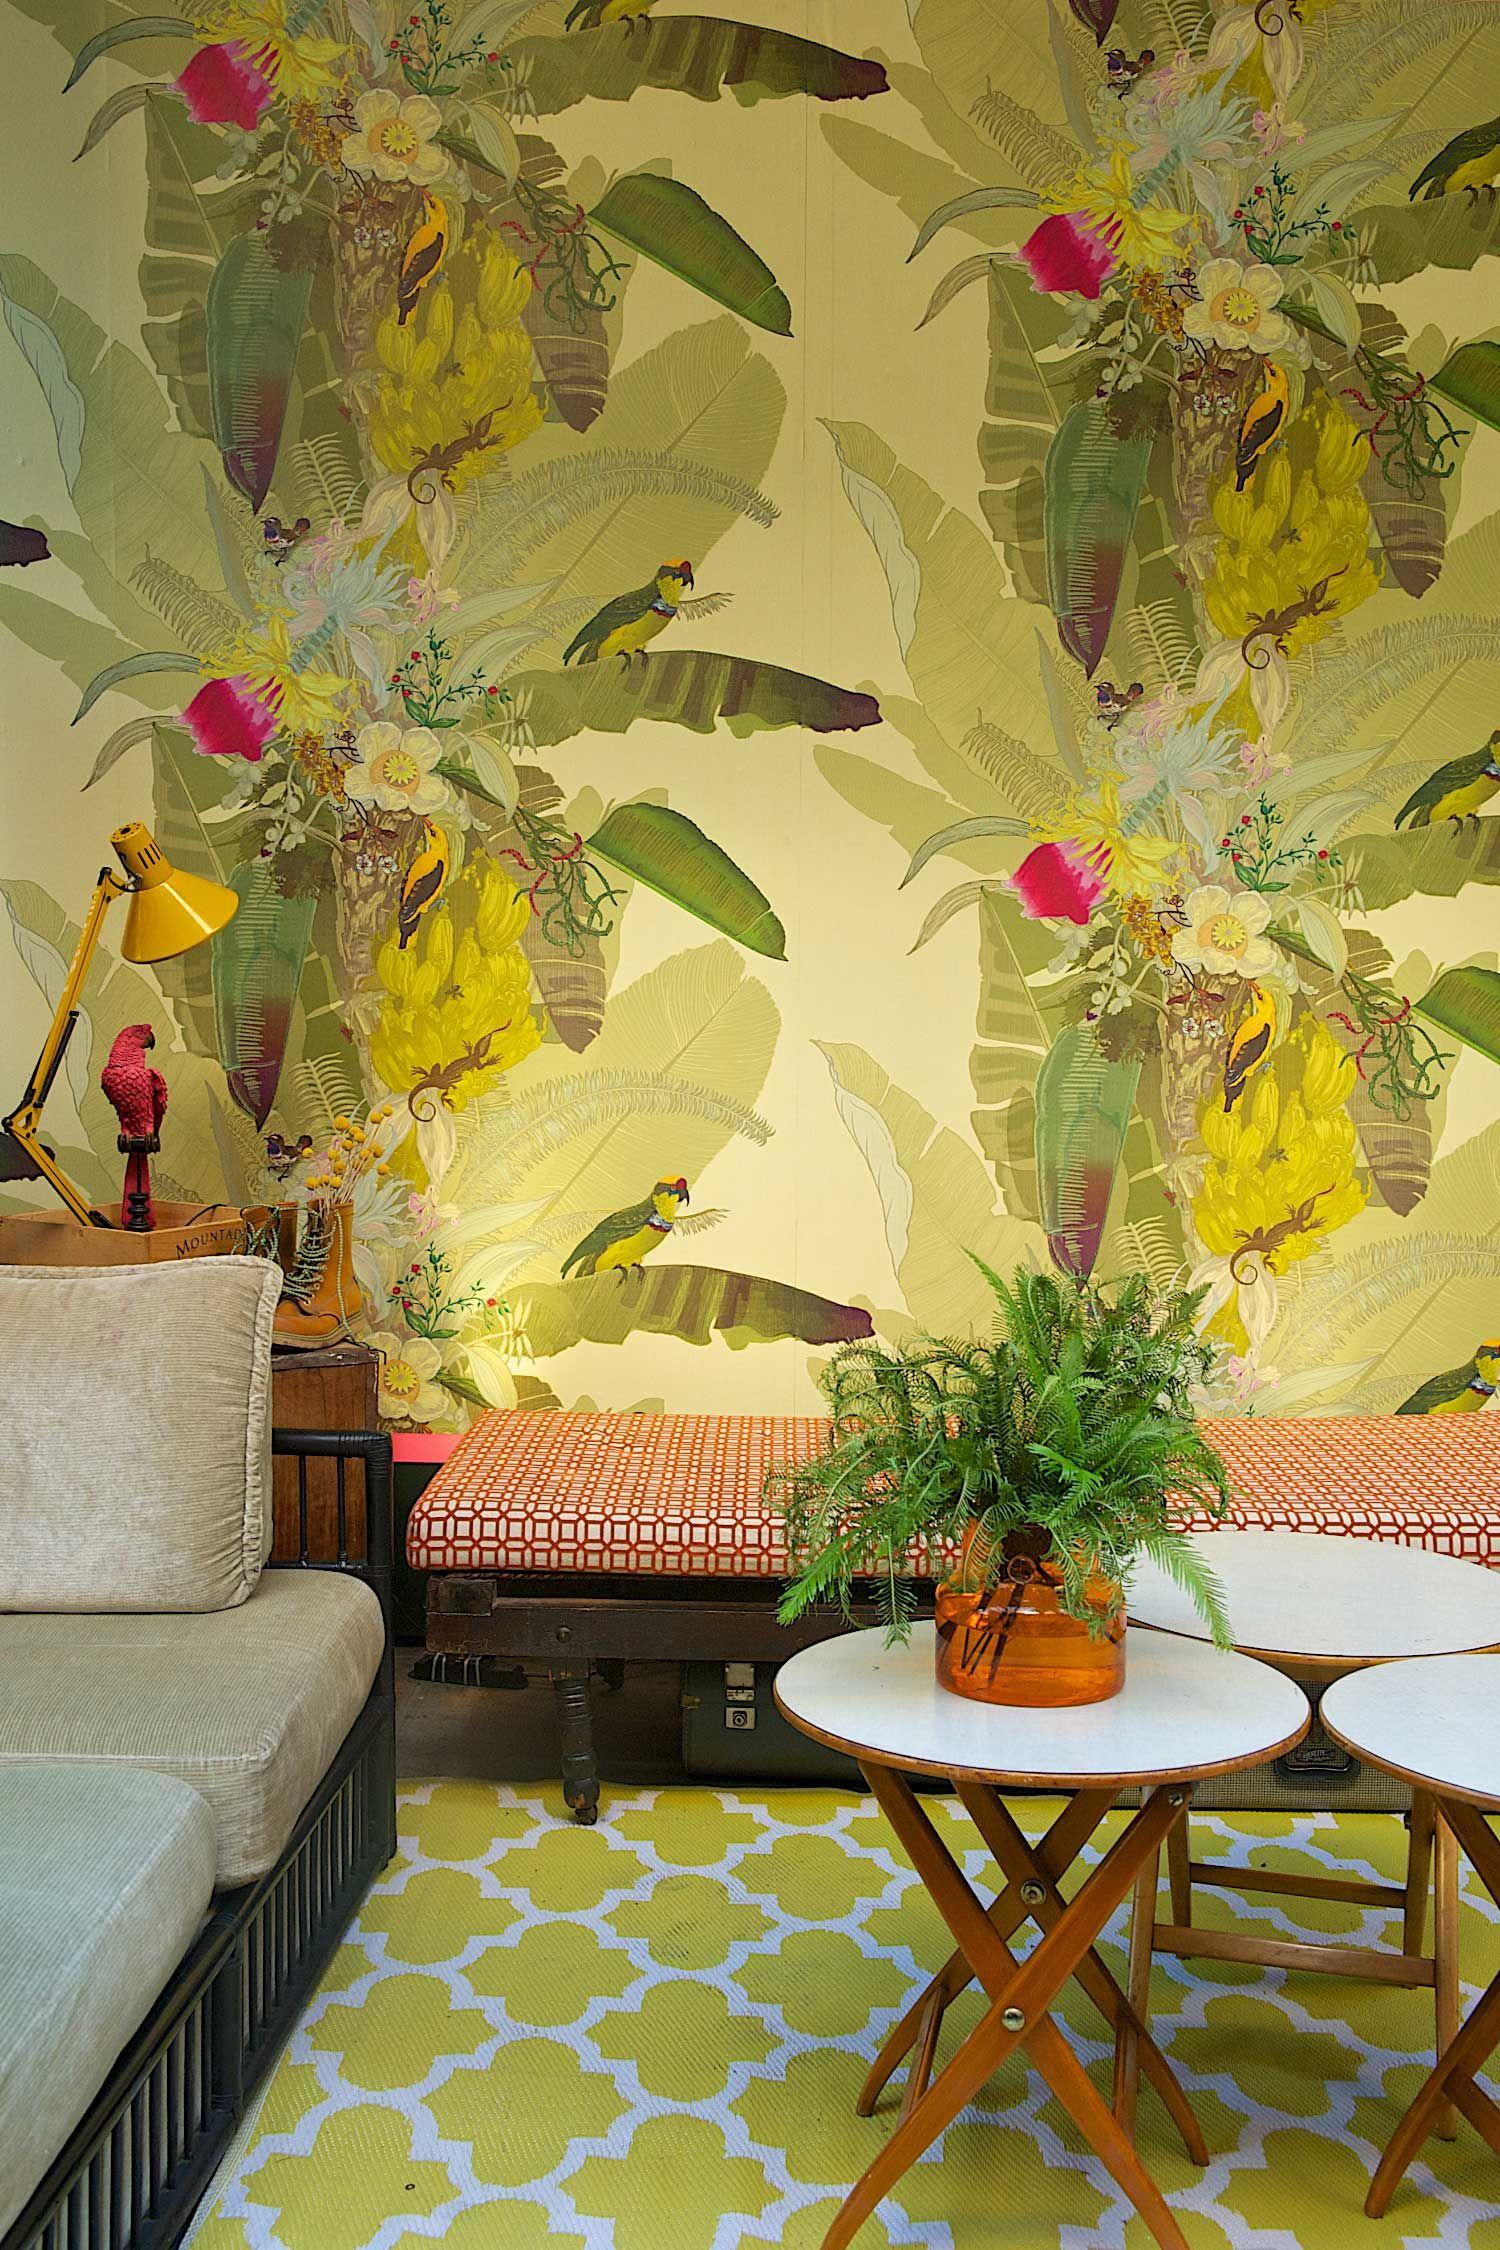 Gumtree Garden Pop-Up Bar by Yellowtrace. | Pinterest | Palm springs ...